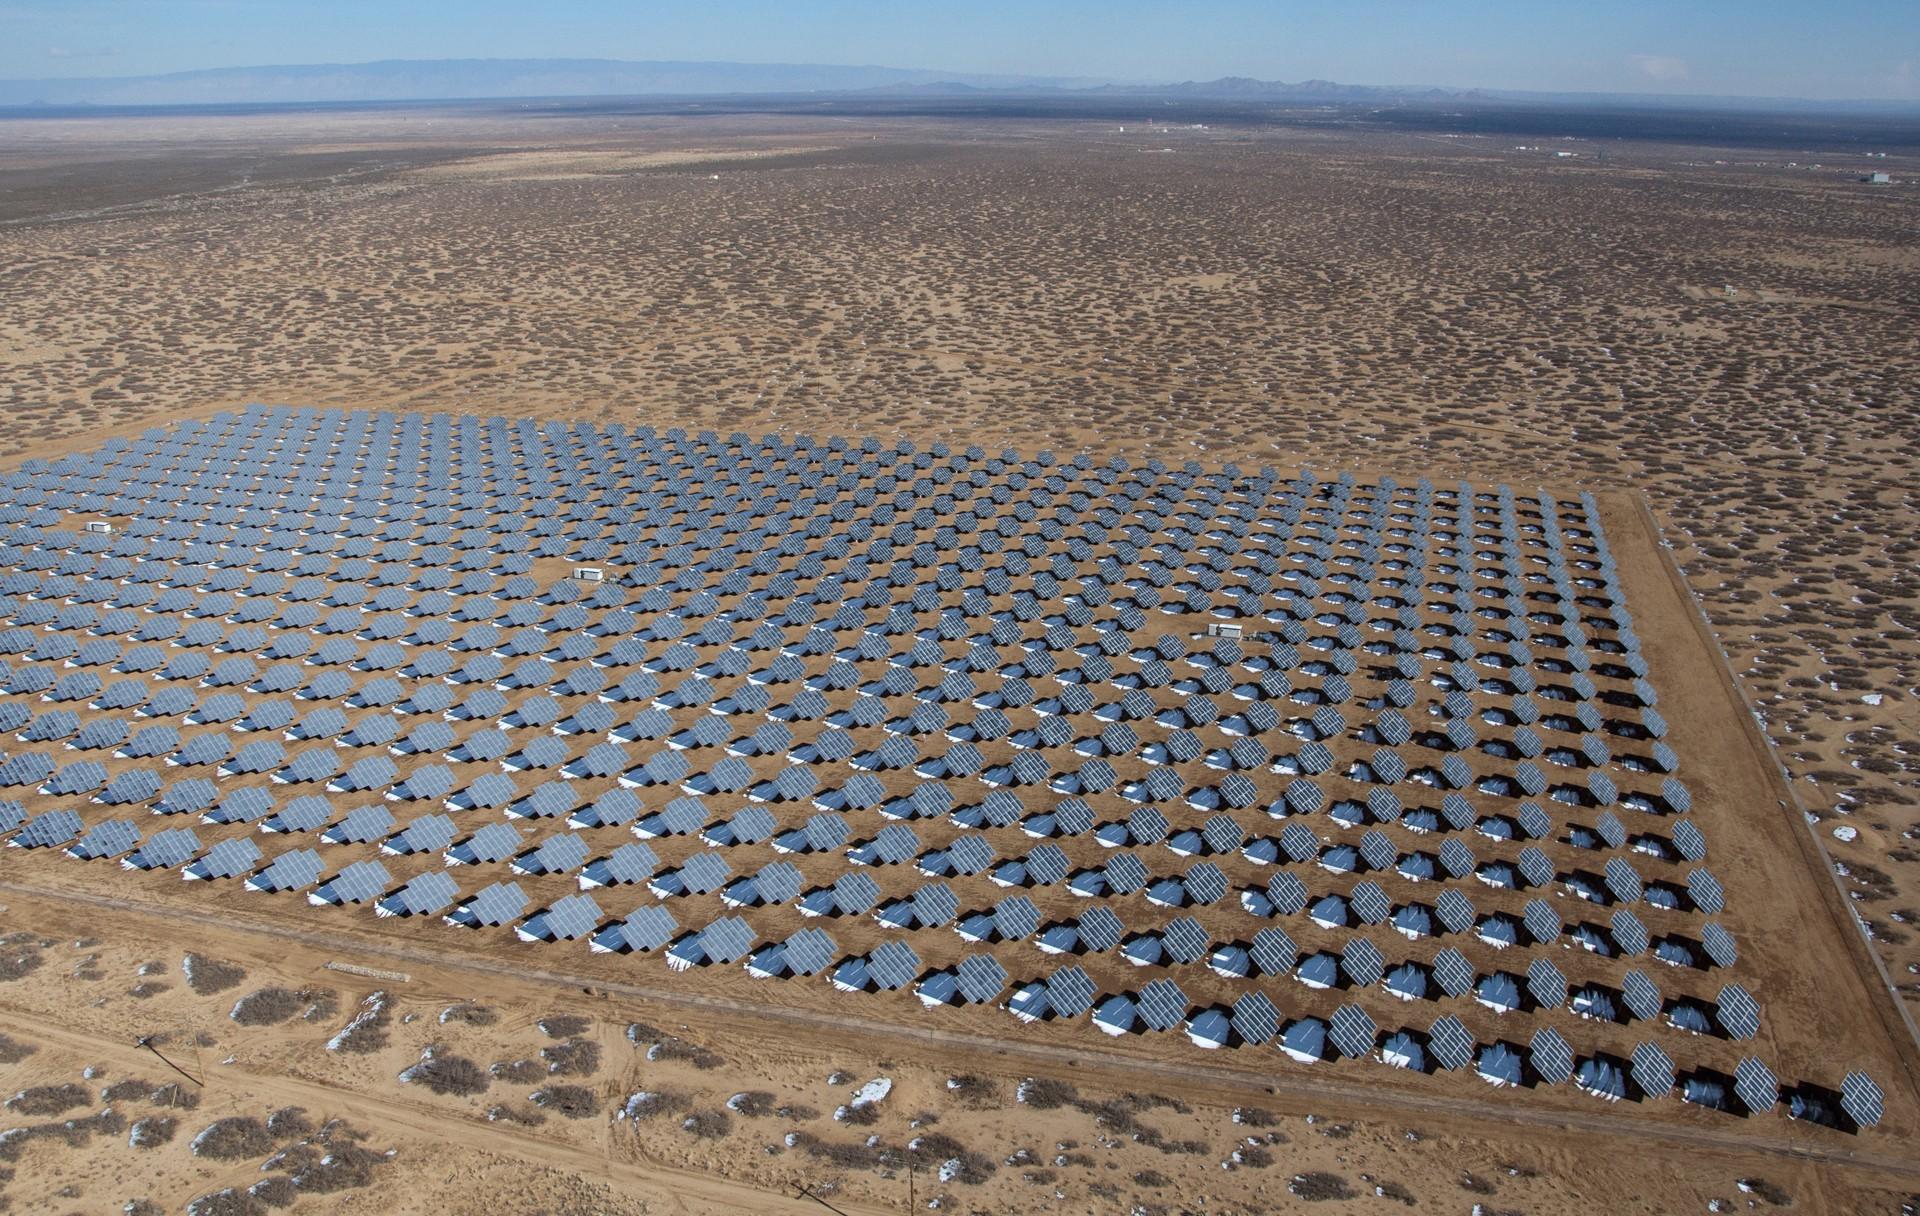 Army announces plans to develop three 30 megawatt solar arrays on original publicscrutiny Gallery